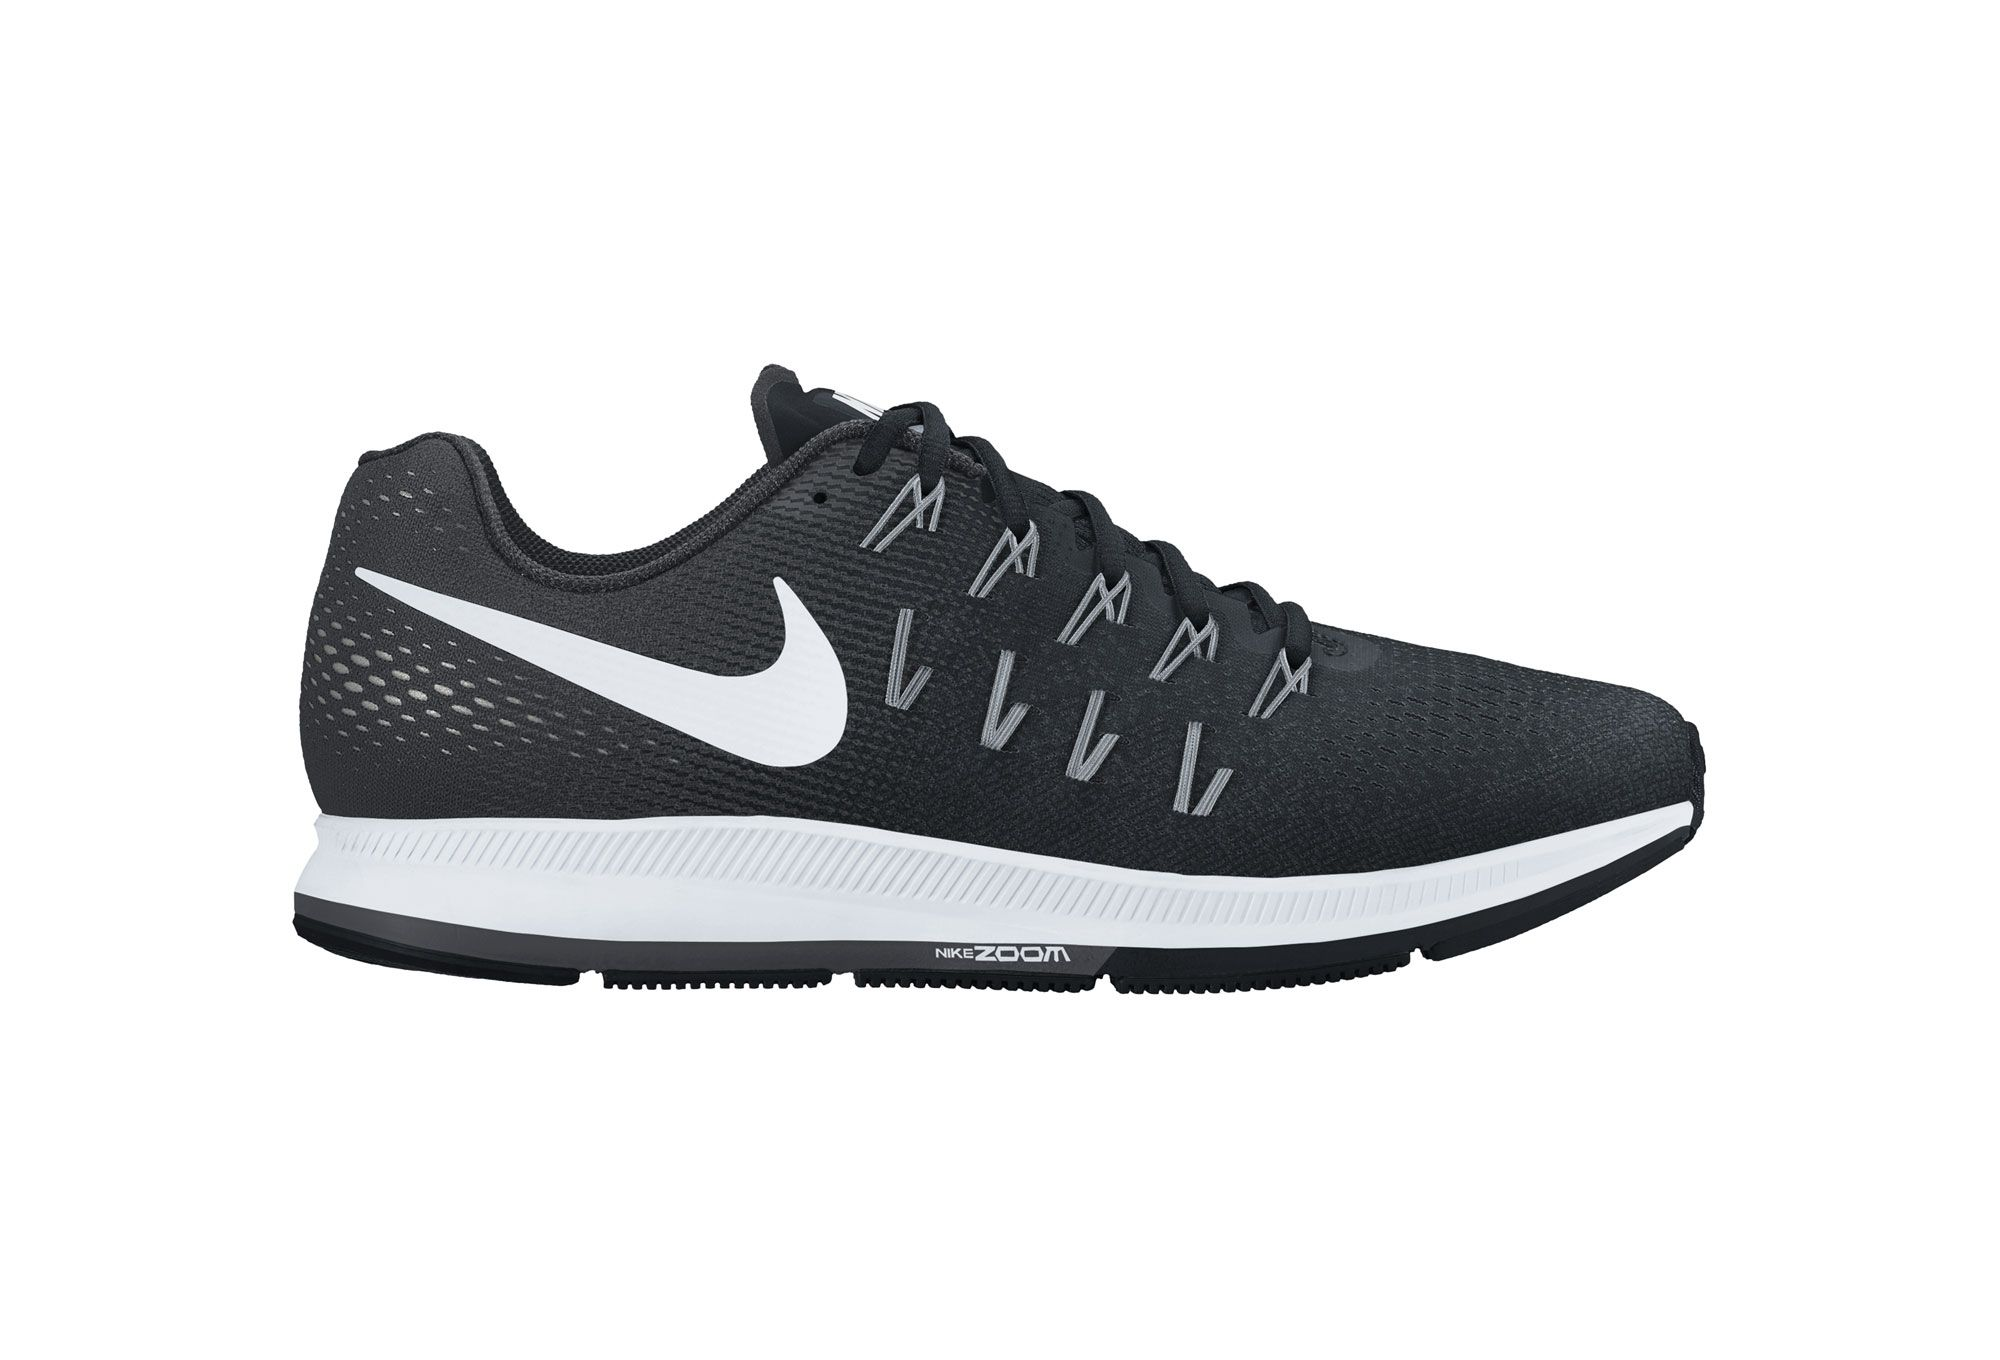 new styles 6f344 3993f Nike Pegasus 33 Noir